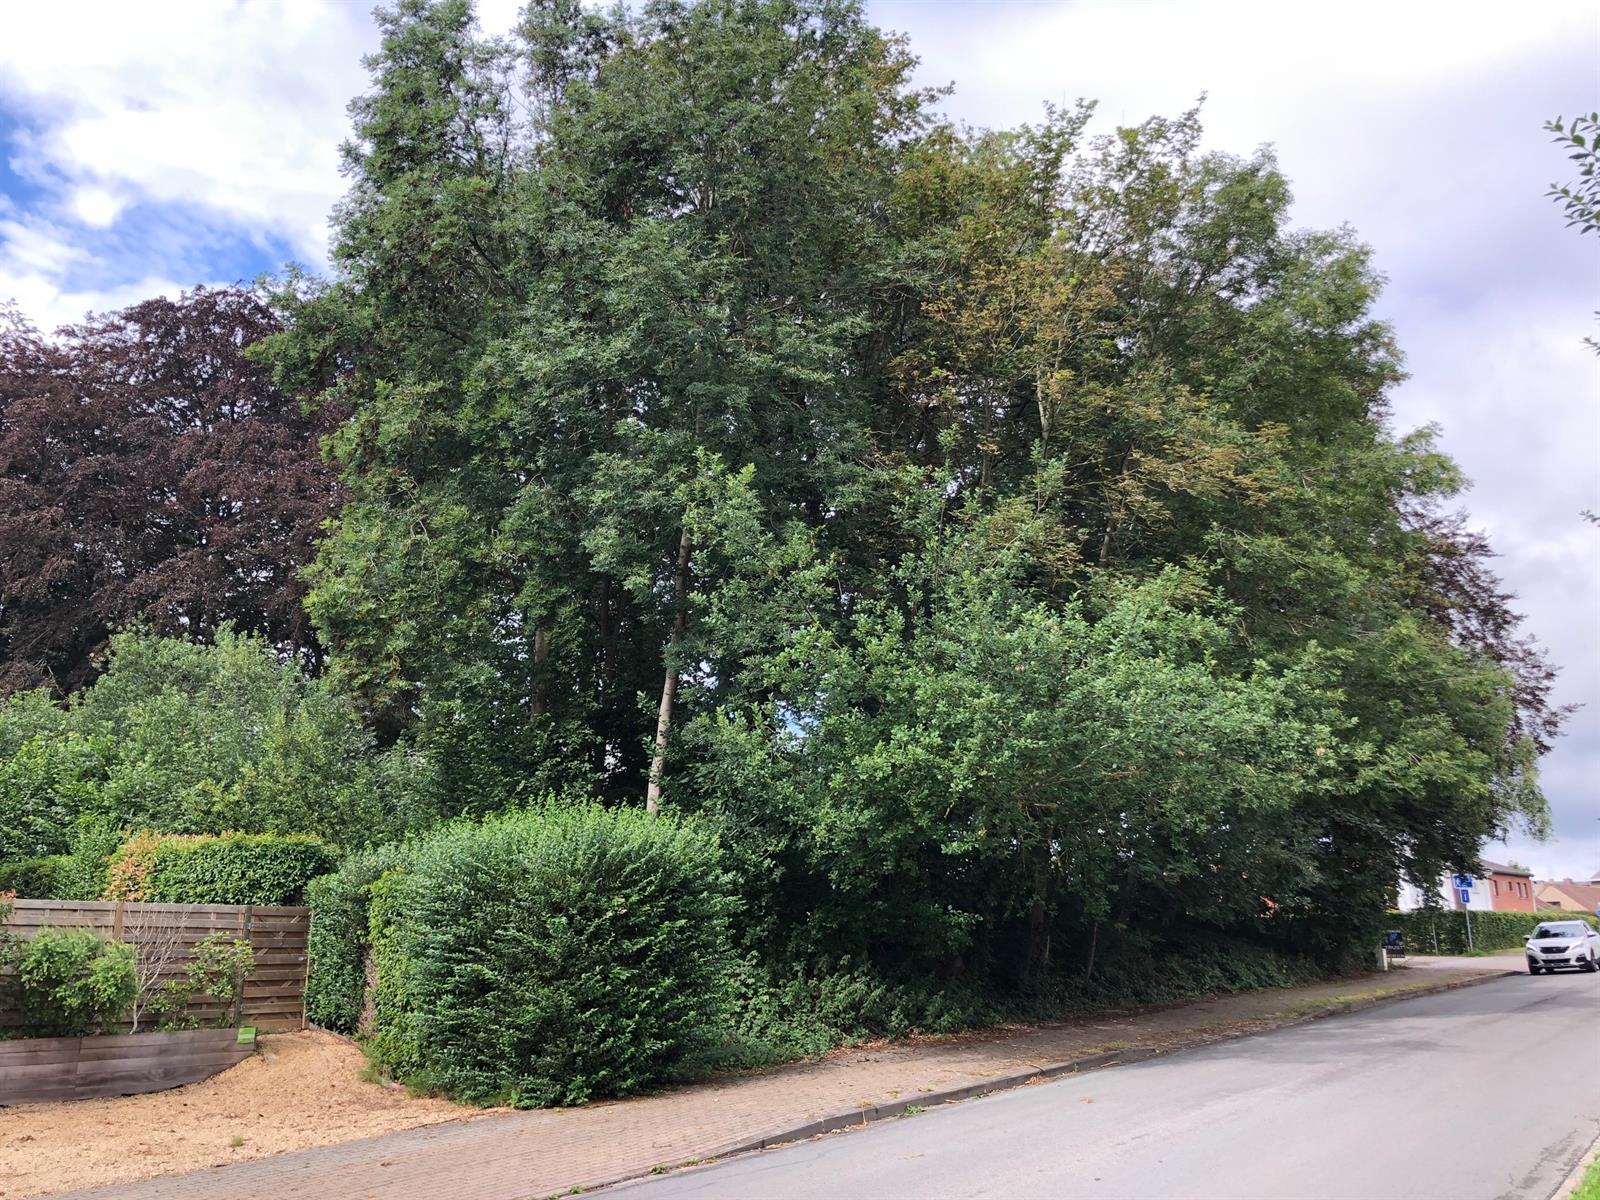 Terrain à bâtir - Ottignies-Louvain-la-Neuve - #4092046-0